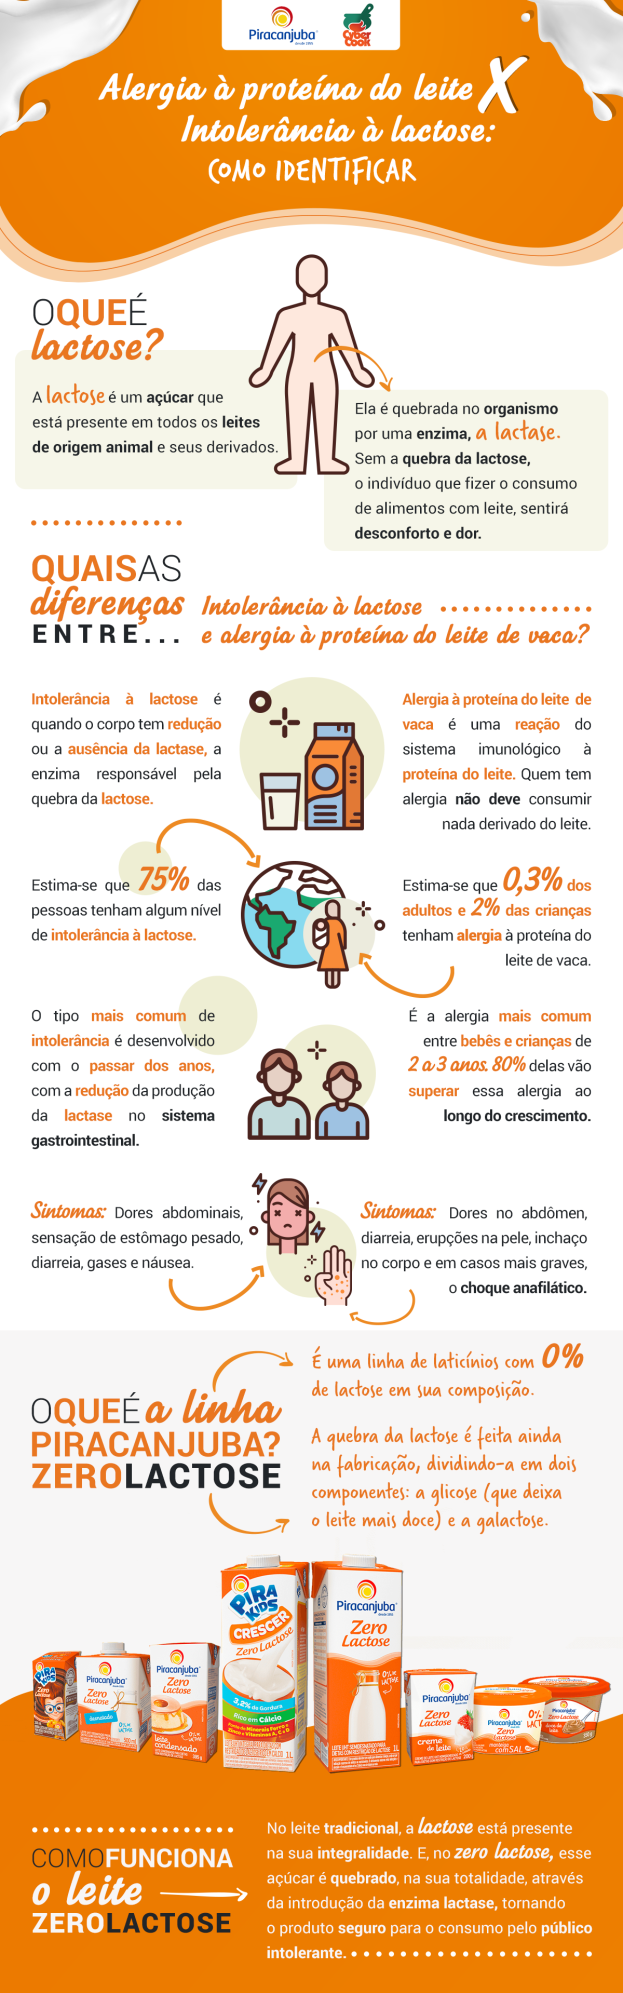 Infográfico alergia a proteína ao leite versus intolerância à lactose/CyberCook